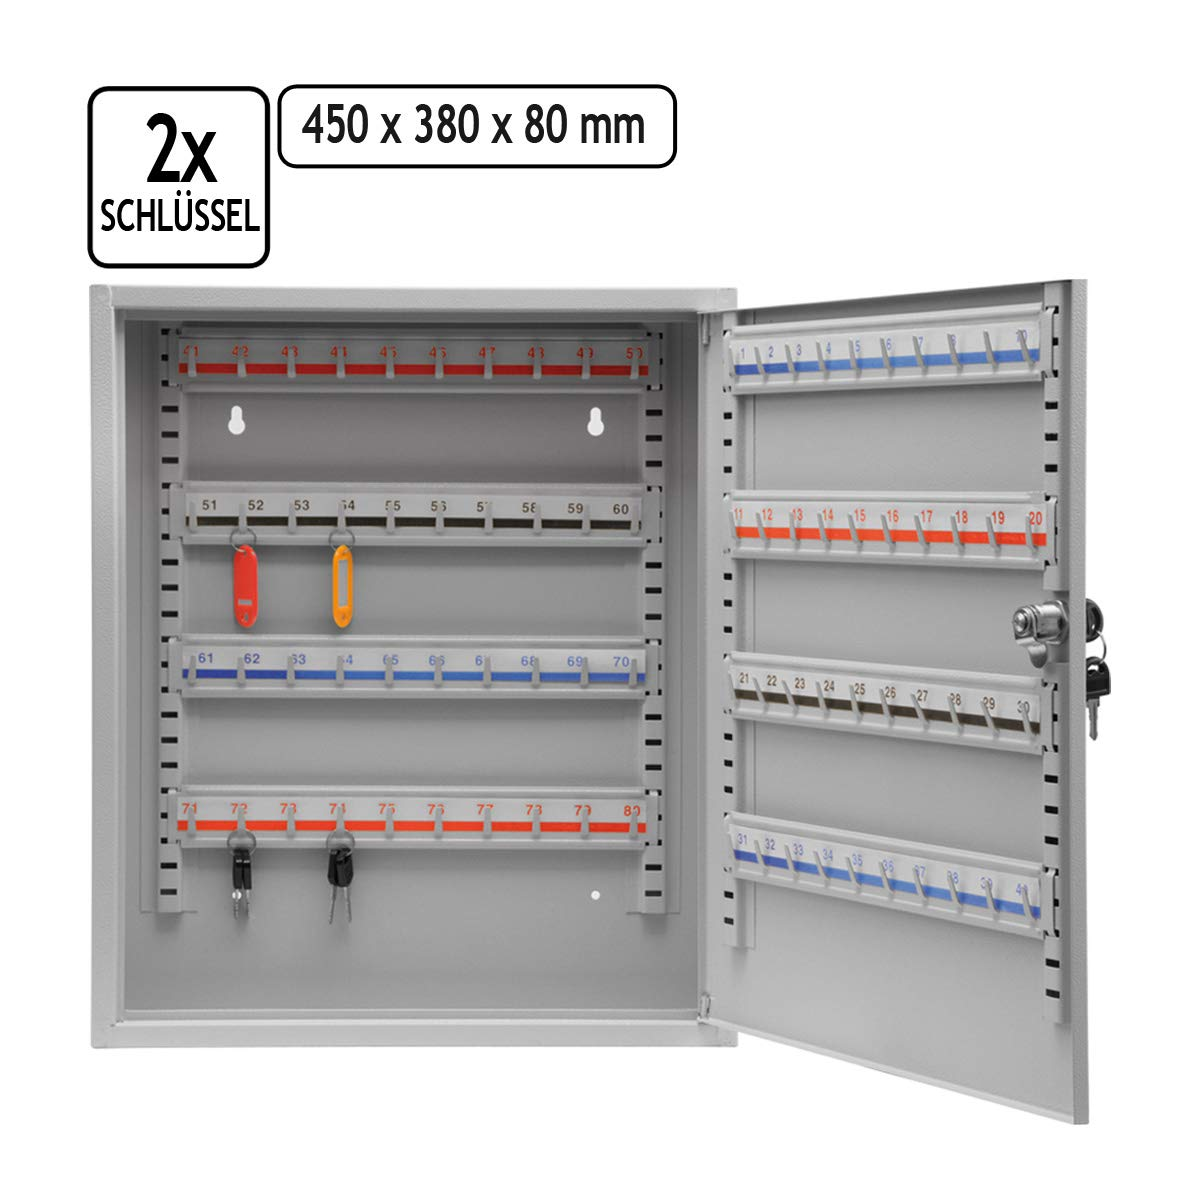 Schl/üsselkasten Schl/üsselschrank Schl/üsselbox abschlie/ßbar Schl/üssel Box